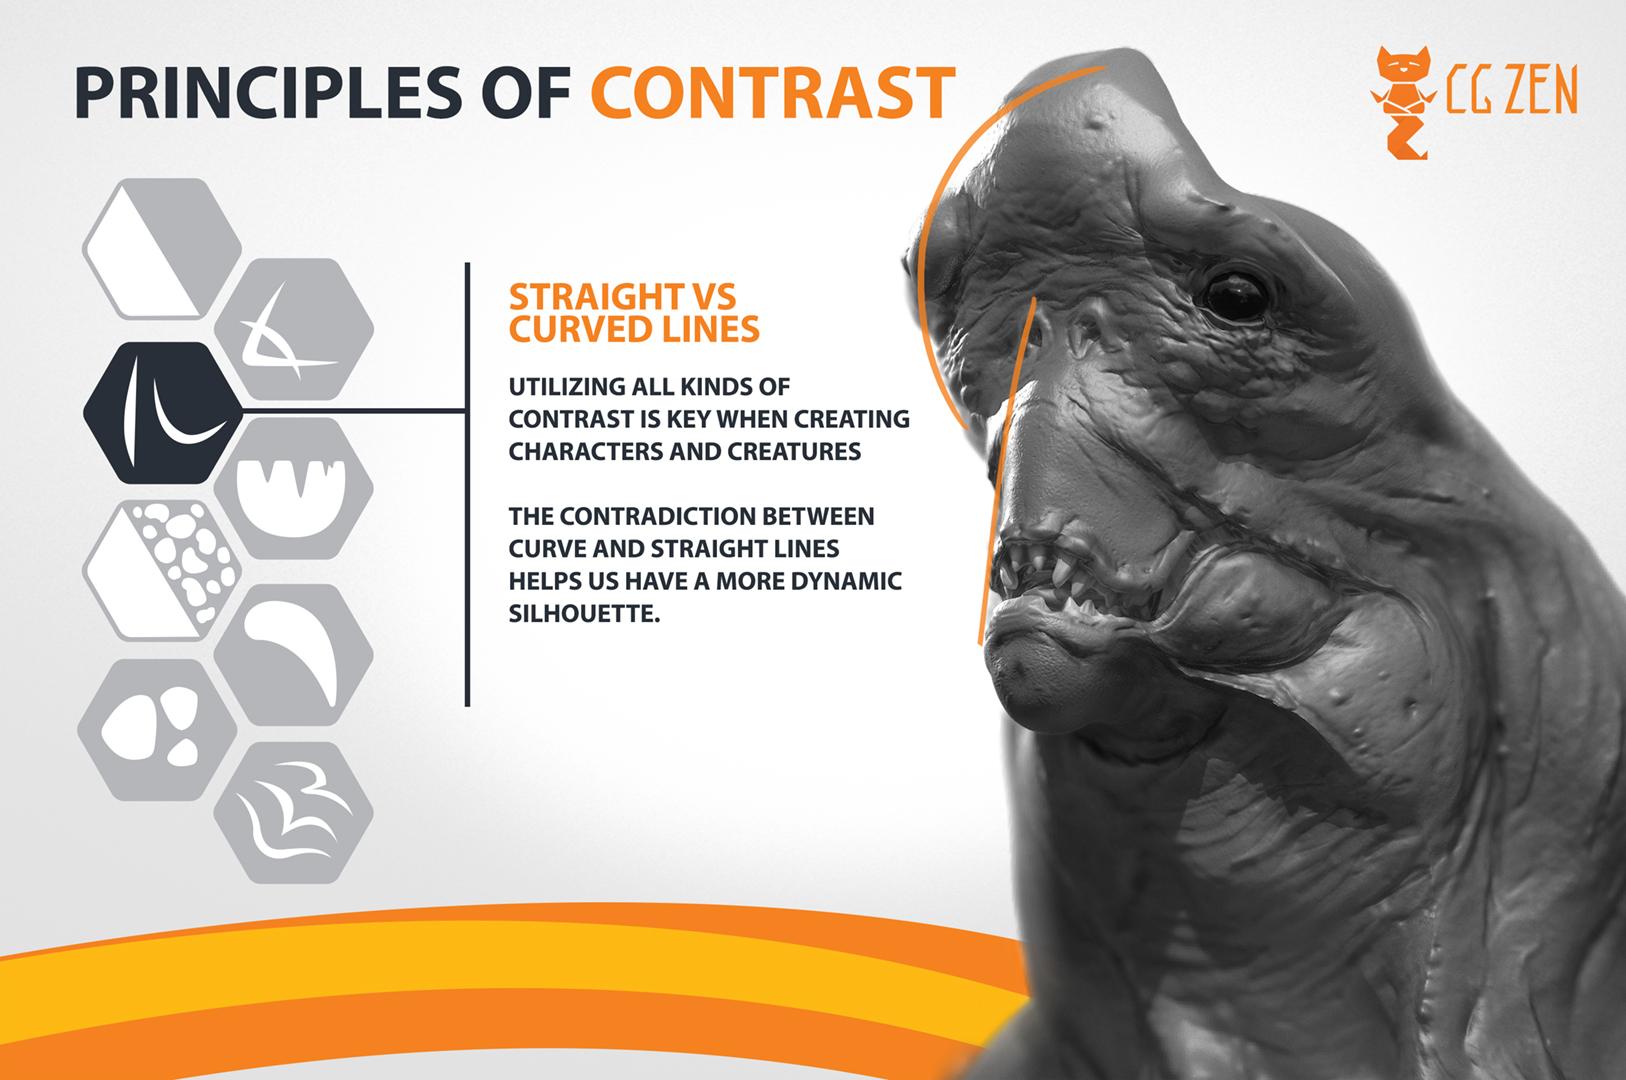 07-contrast-design-straight-vs-curve-cgzen-EN